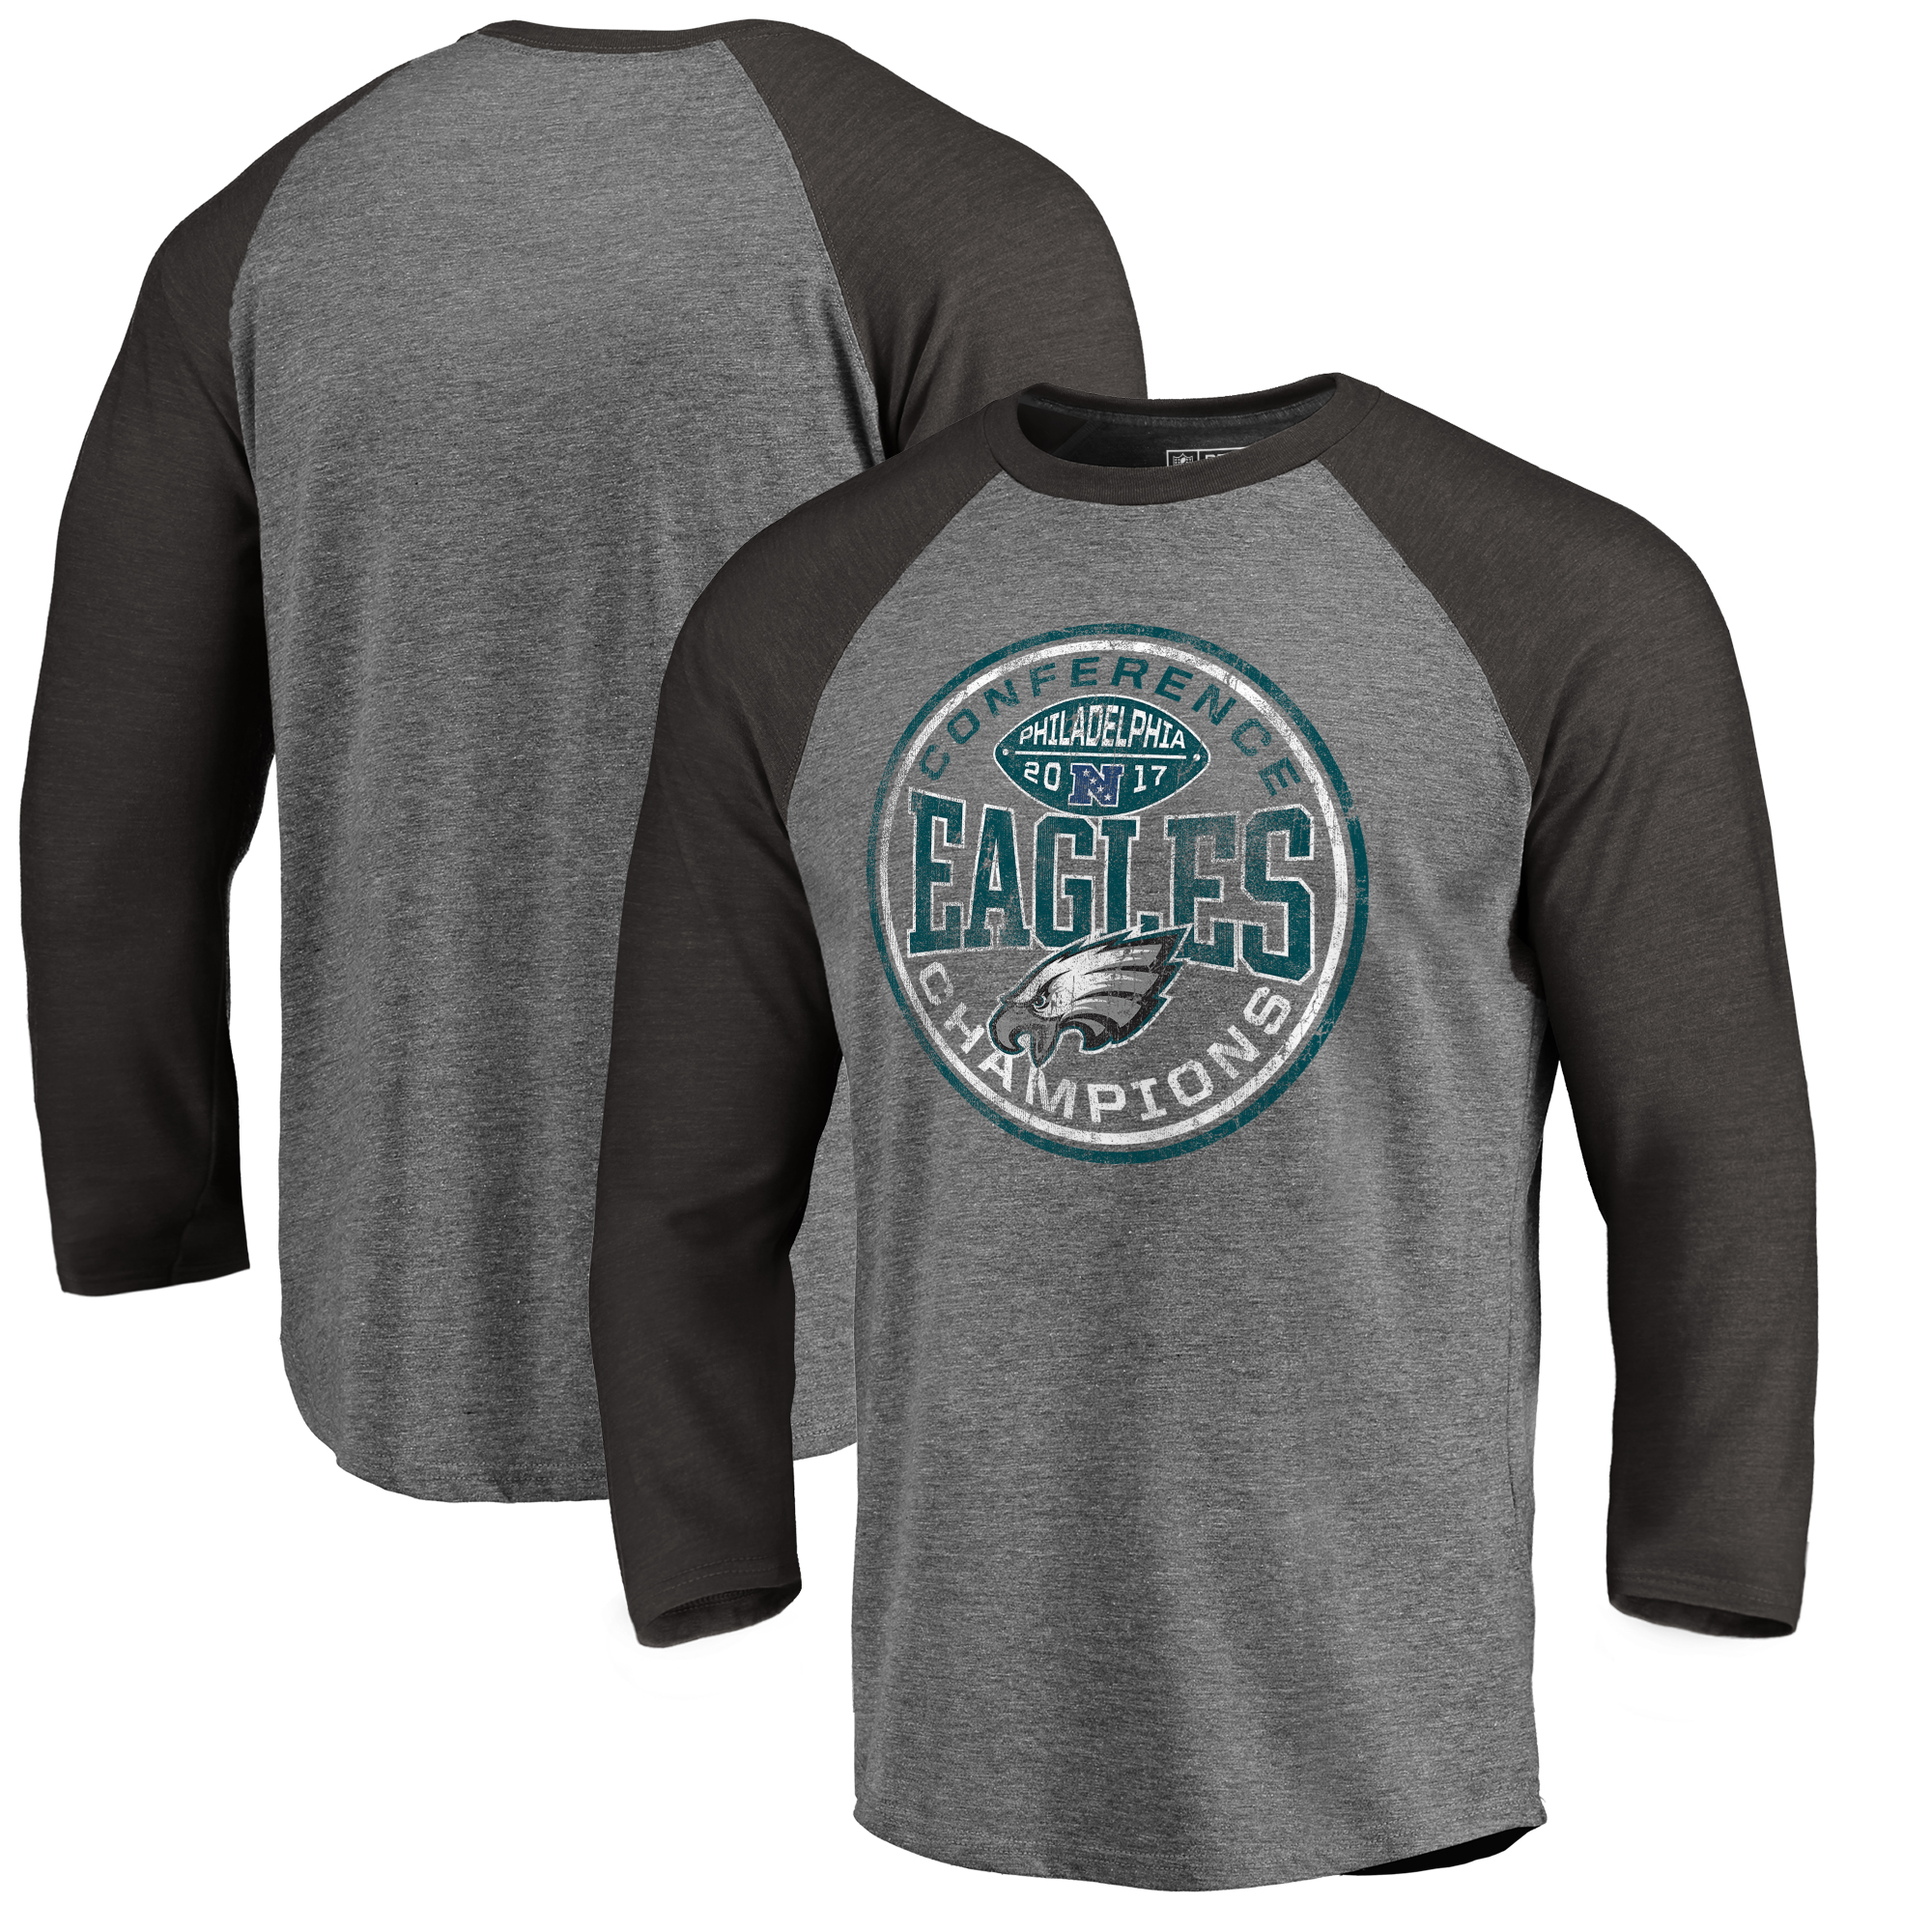 Philadelphia Eagles NFL Pro Line by Fanatics Branded 2017 NFC Champions Twins Tri-Blend 3/4-Sleeve Raglan T-Shirt - Heather Gray